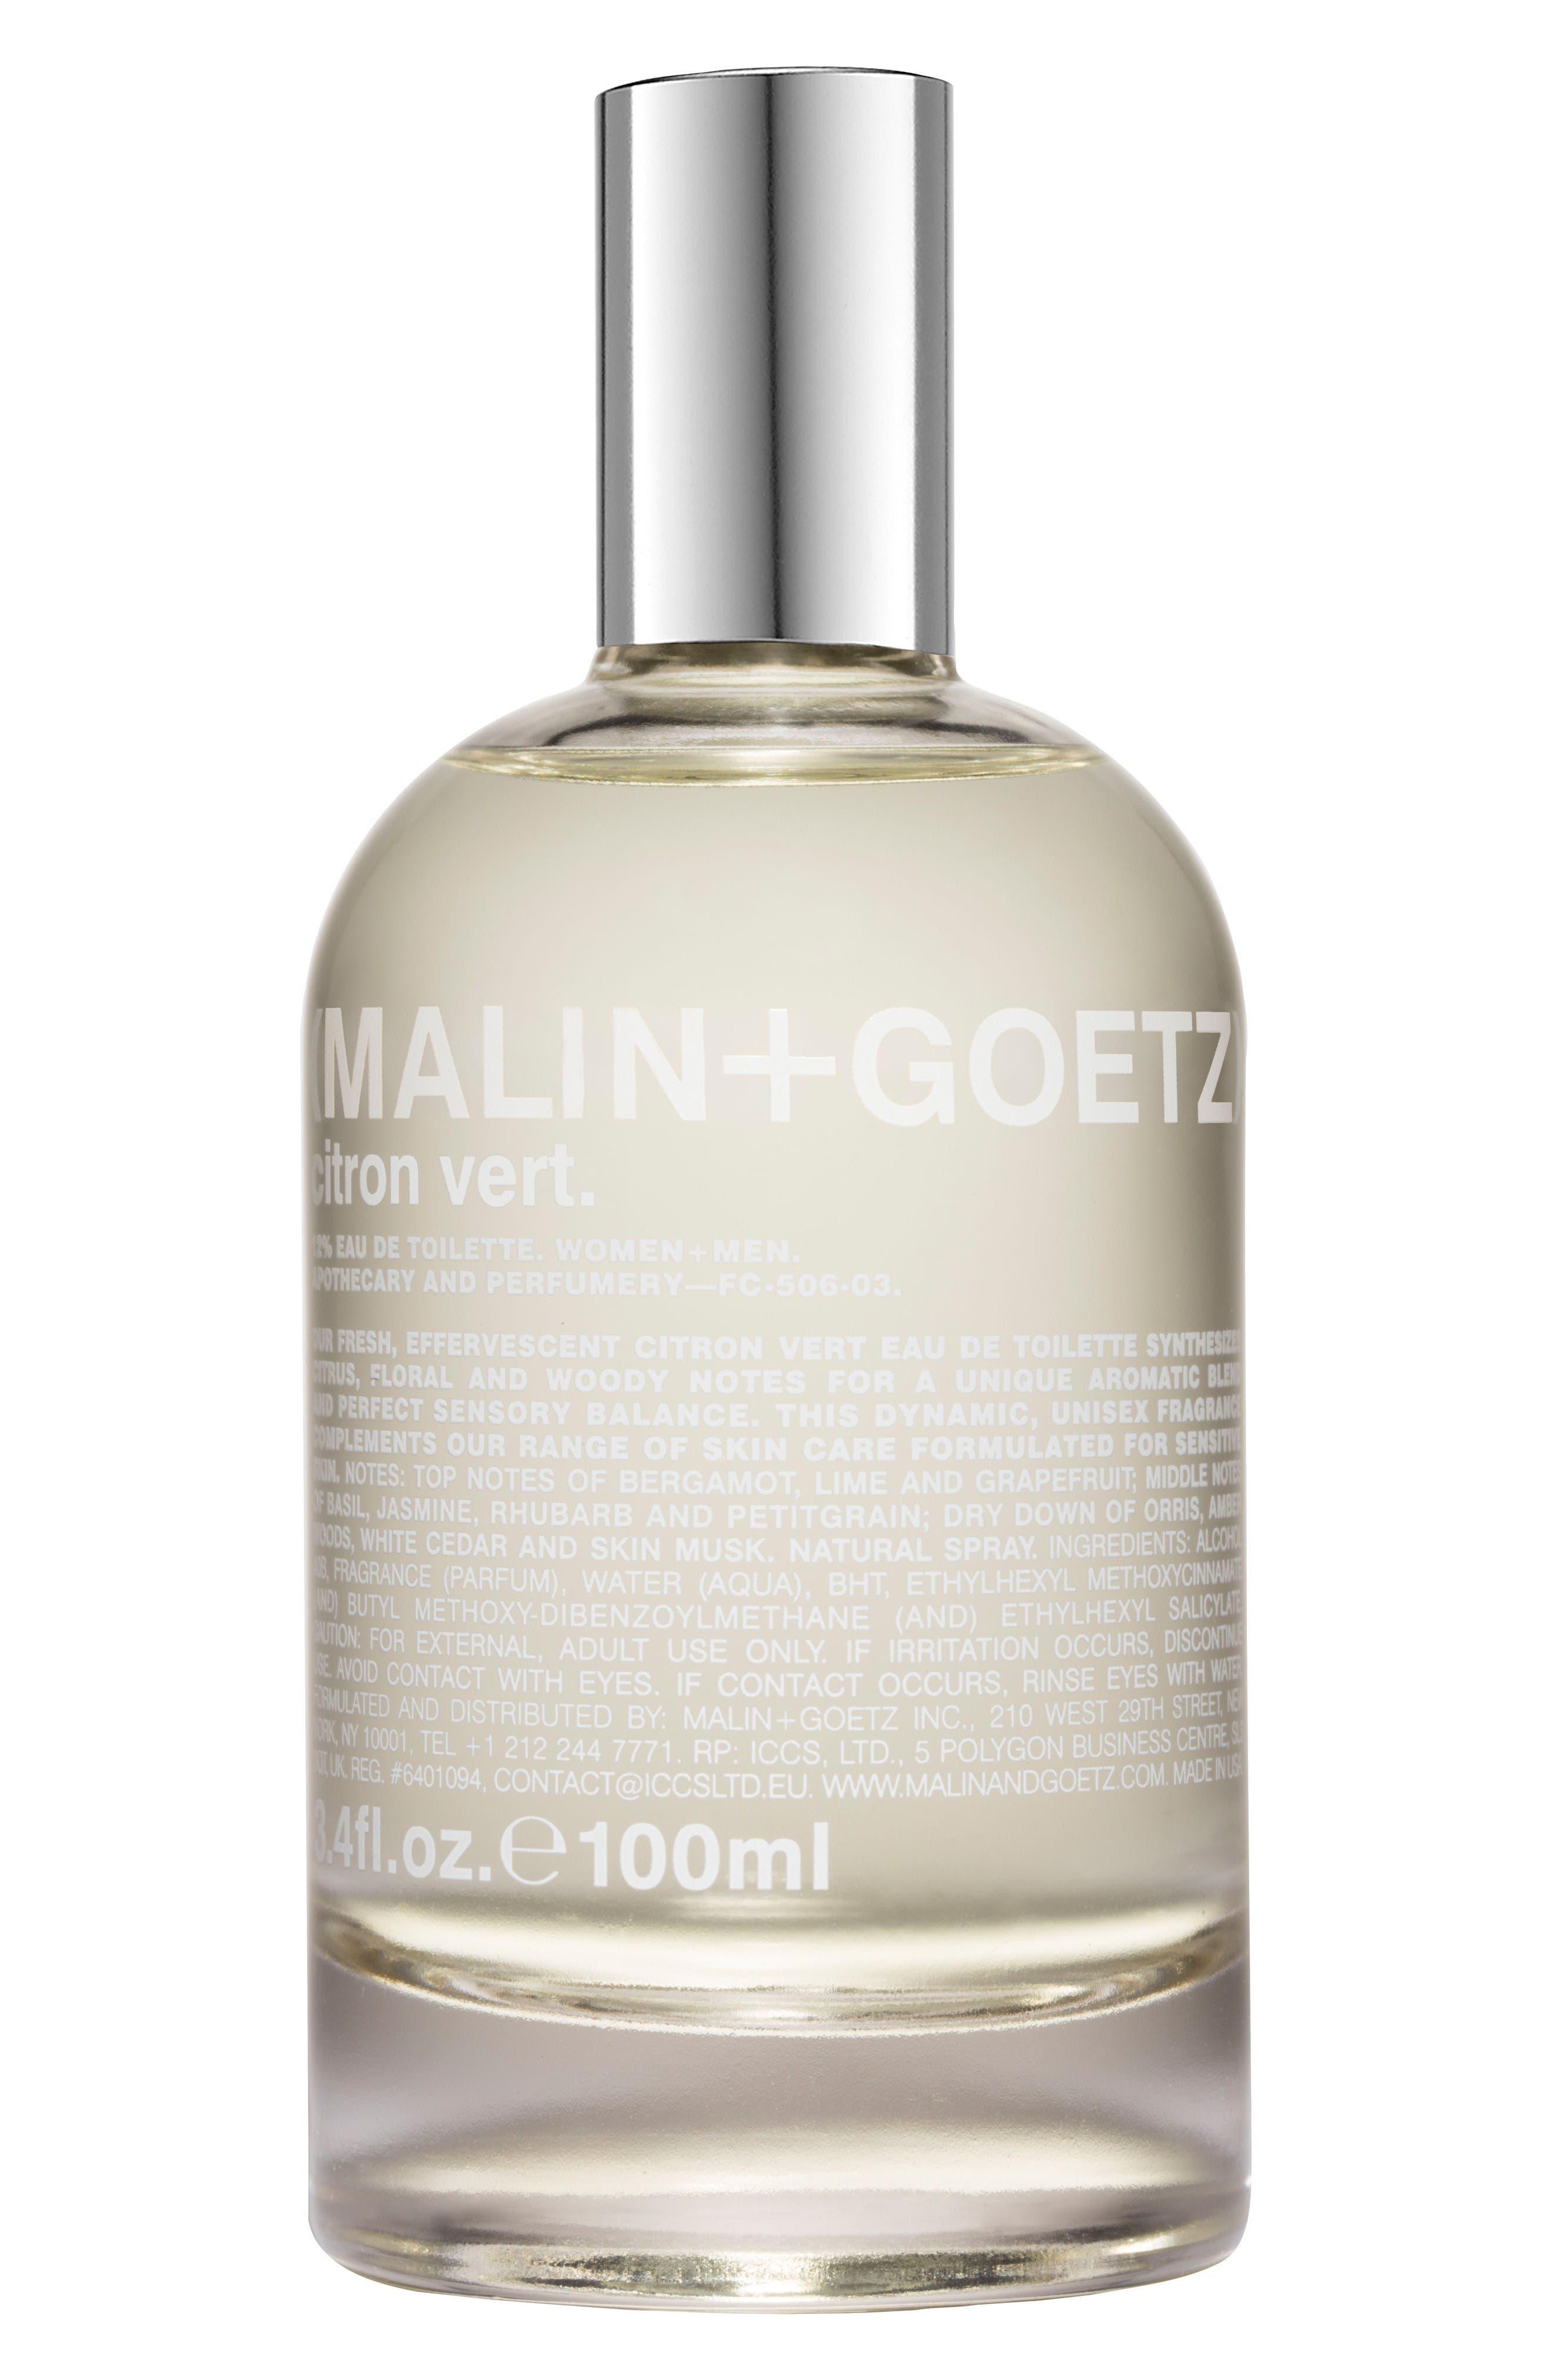 Alternate Image 1 Selected - SPACE.NK.apothecary Malin + Goetz Citron Vert Eau de Toilette